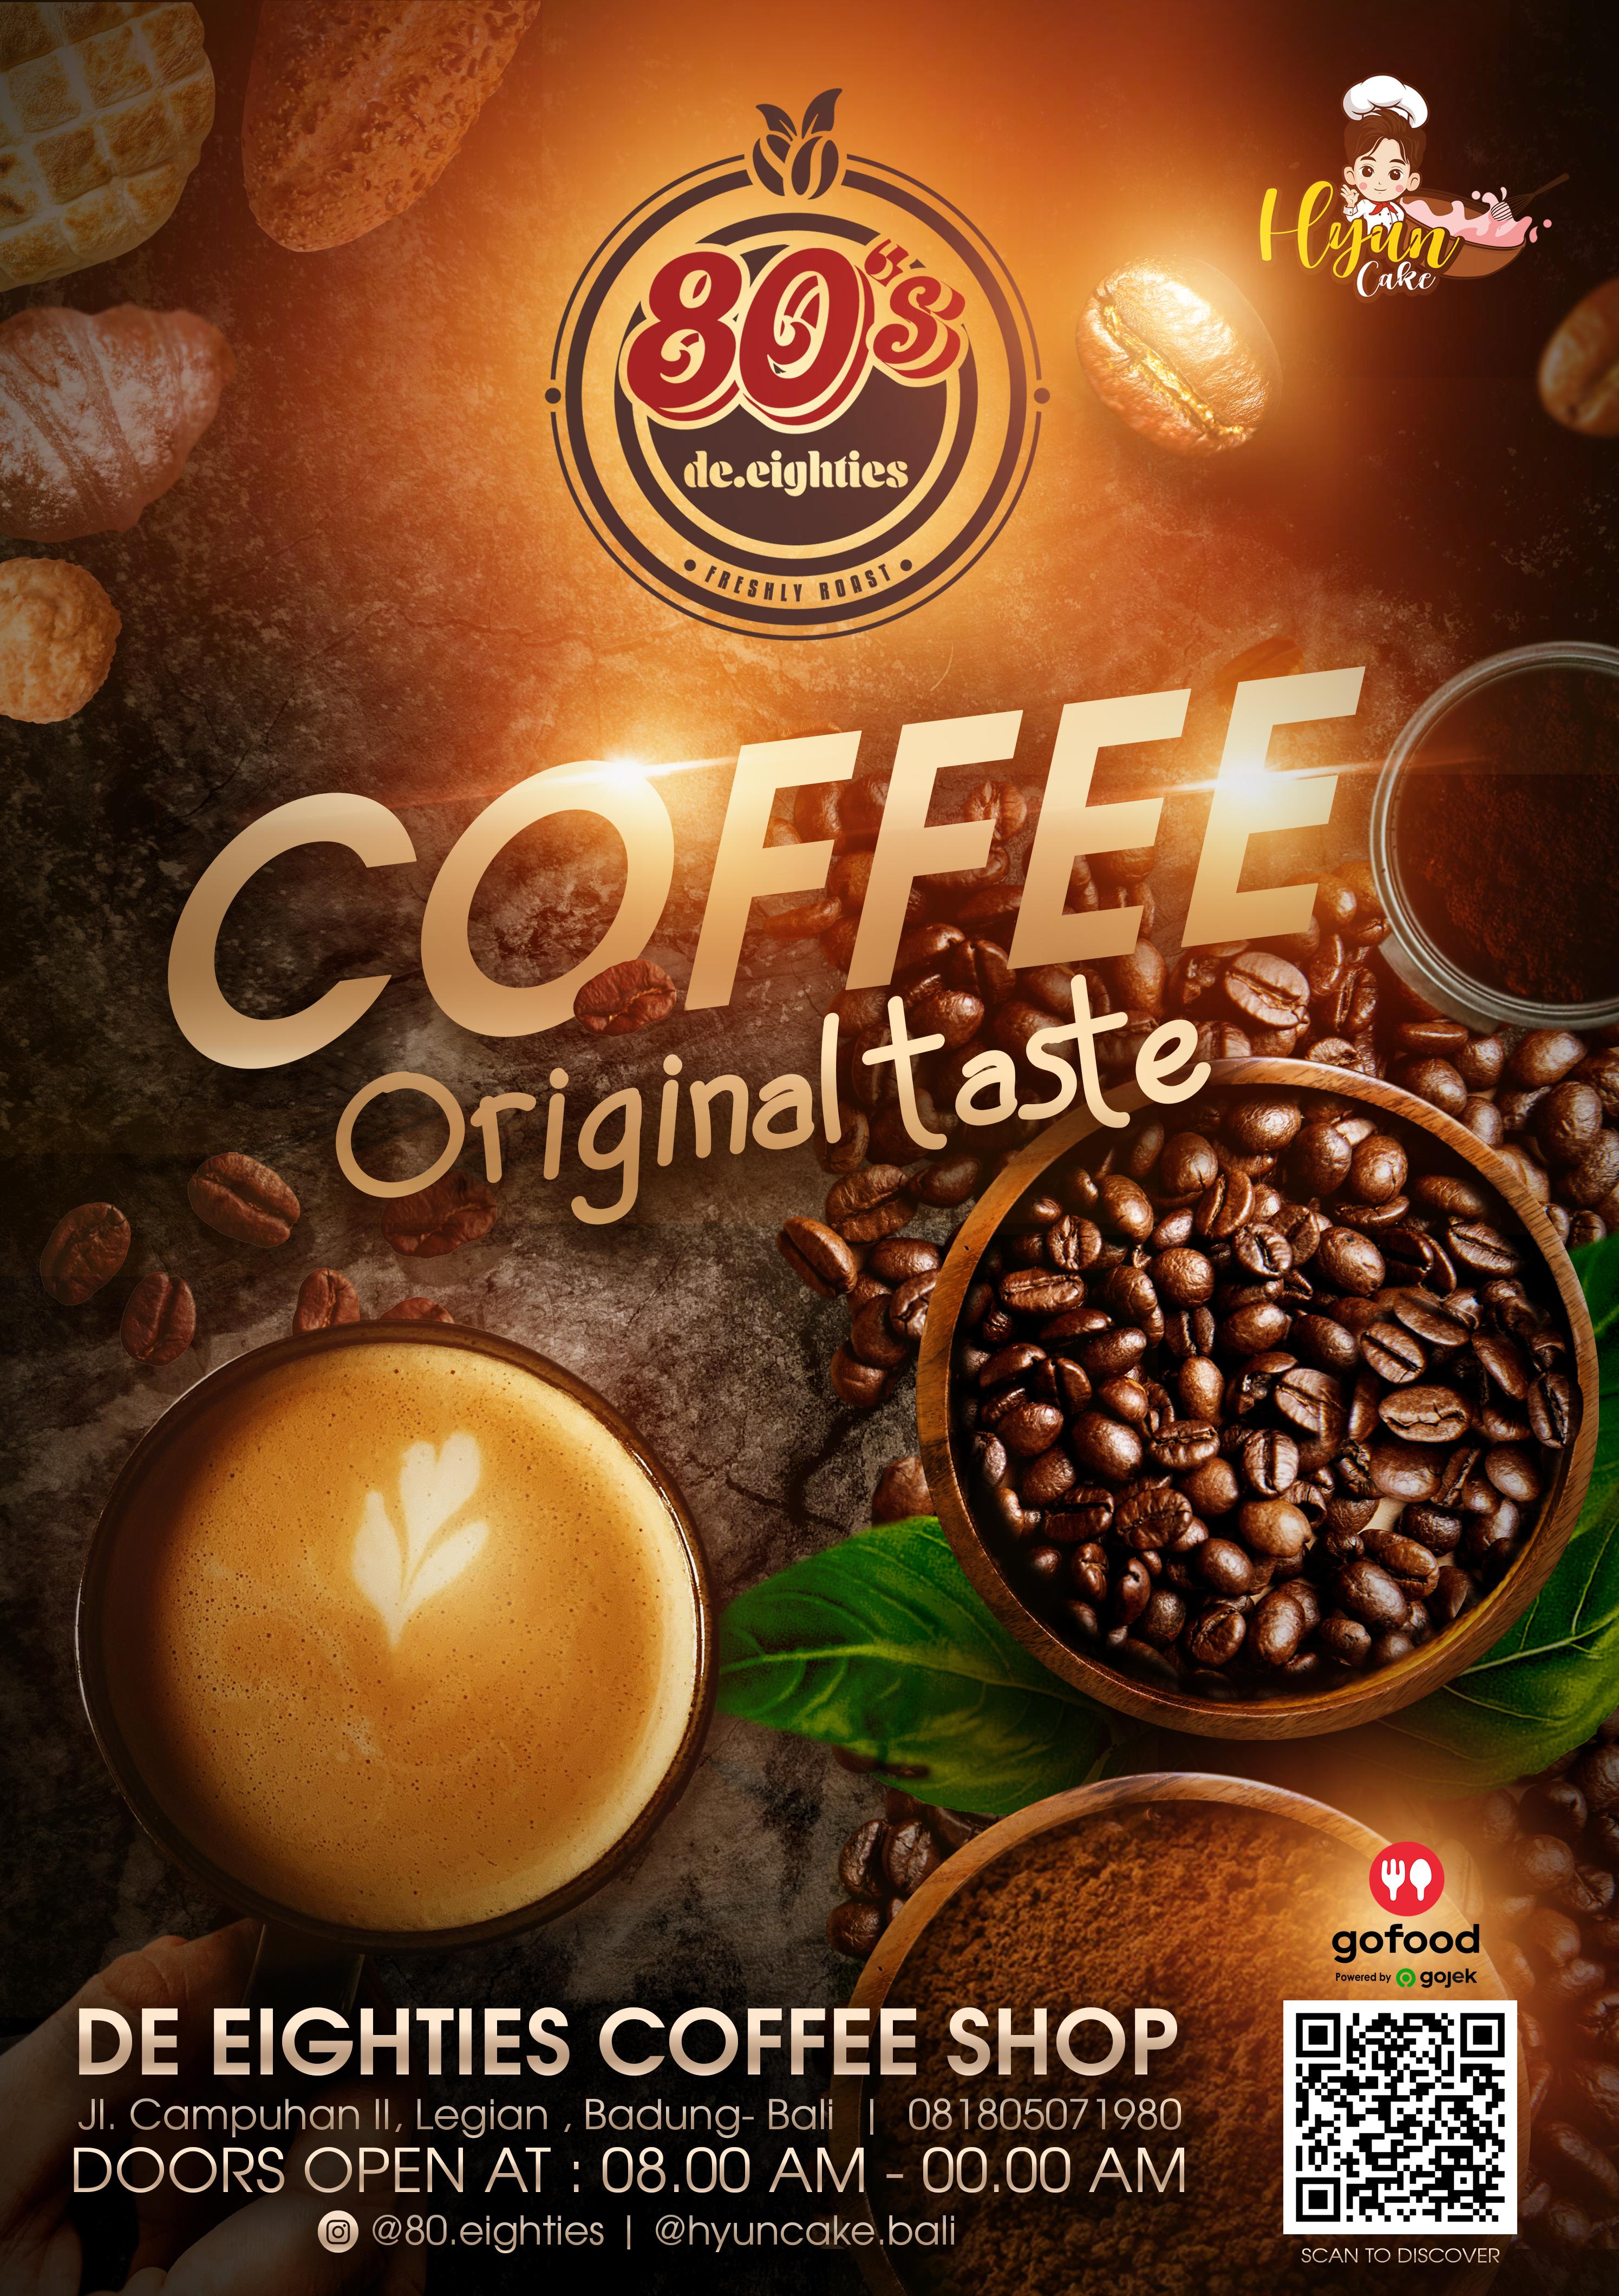 De eighties coffee shop final 8bd41288ce